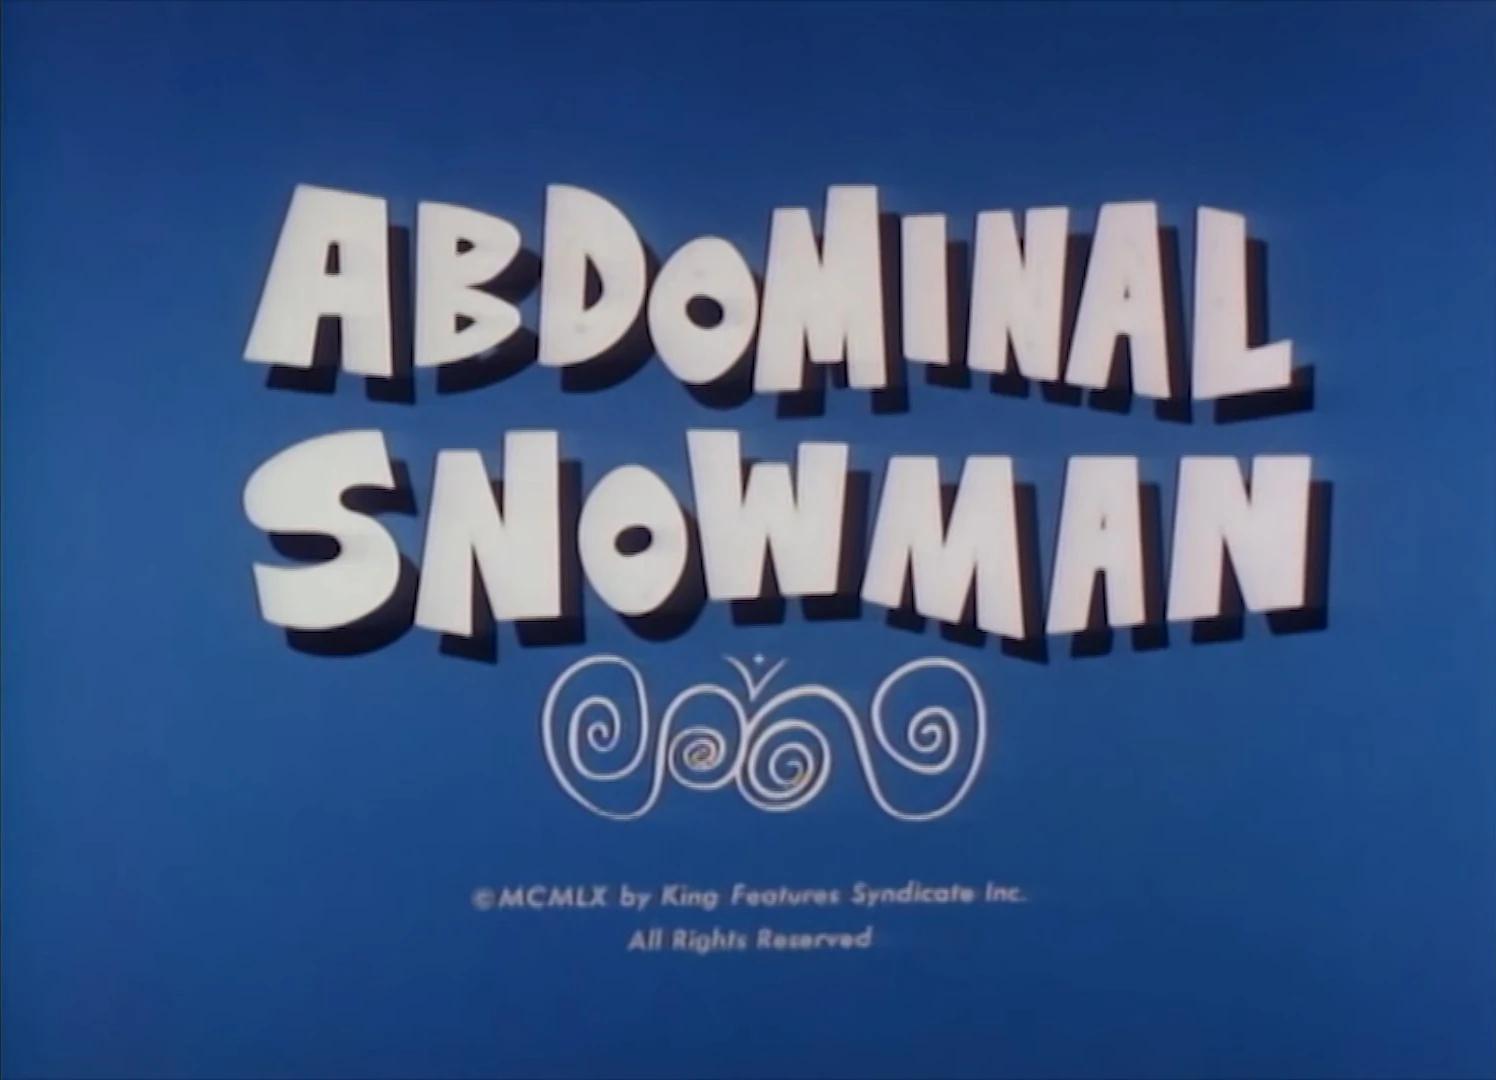 Abdominal Snowman credits